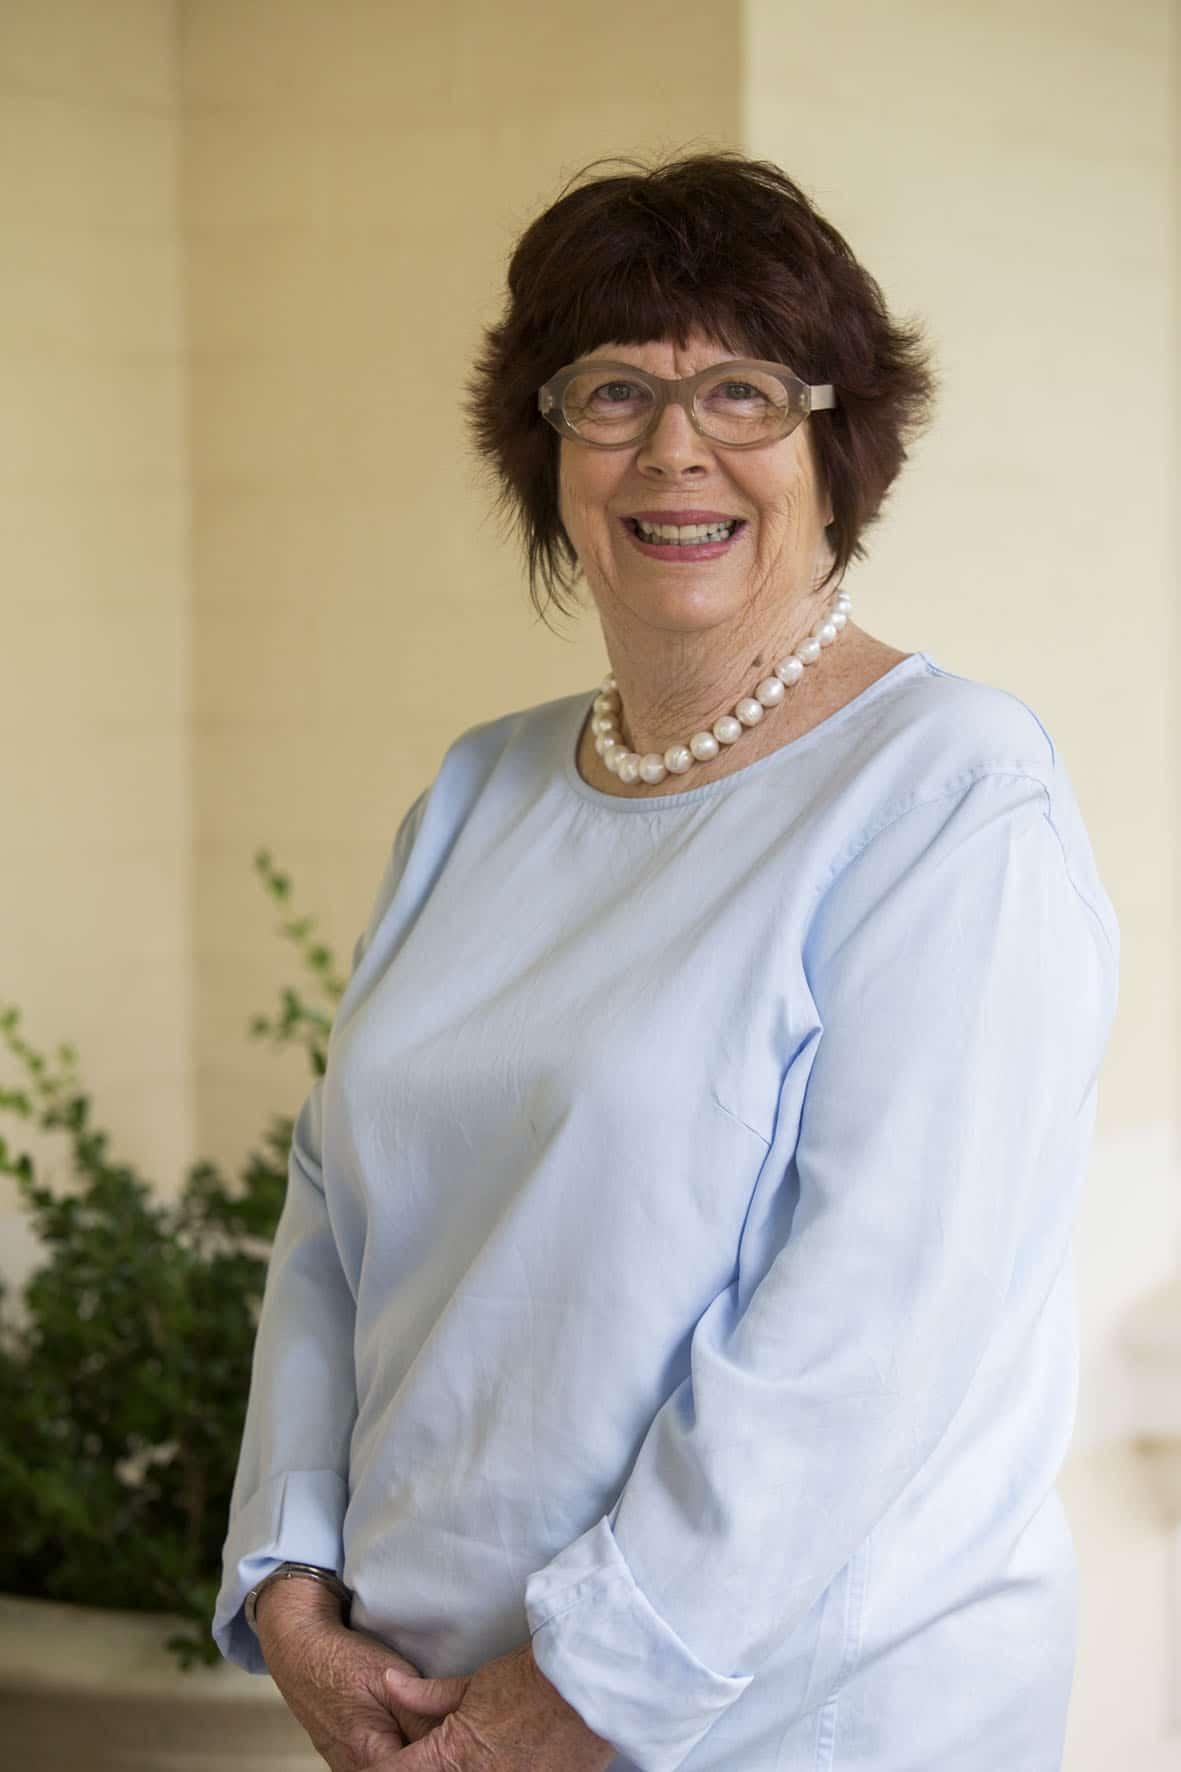 perth girls school - best high schools in perth - PLC Perth